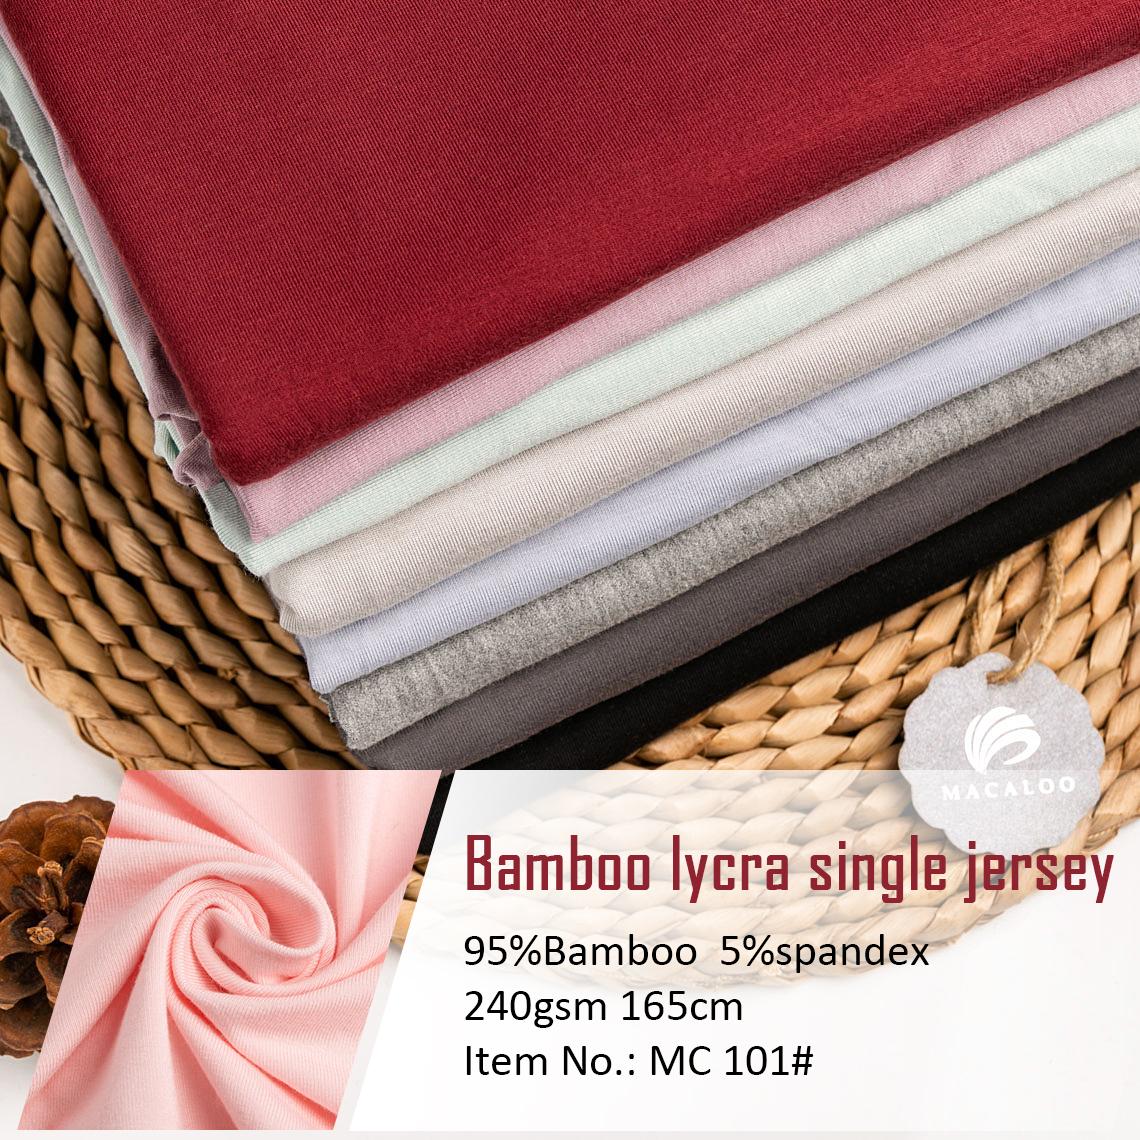 337021bfdd5 Bamboo Fabric T Shirts Wholesale   Top Mode Depot